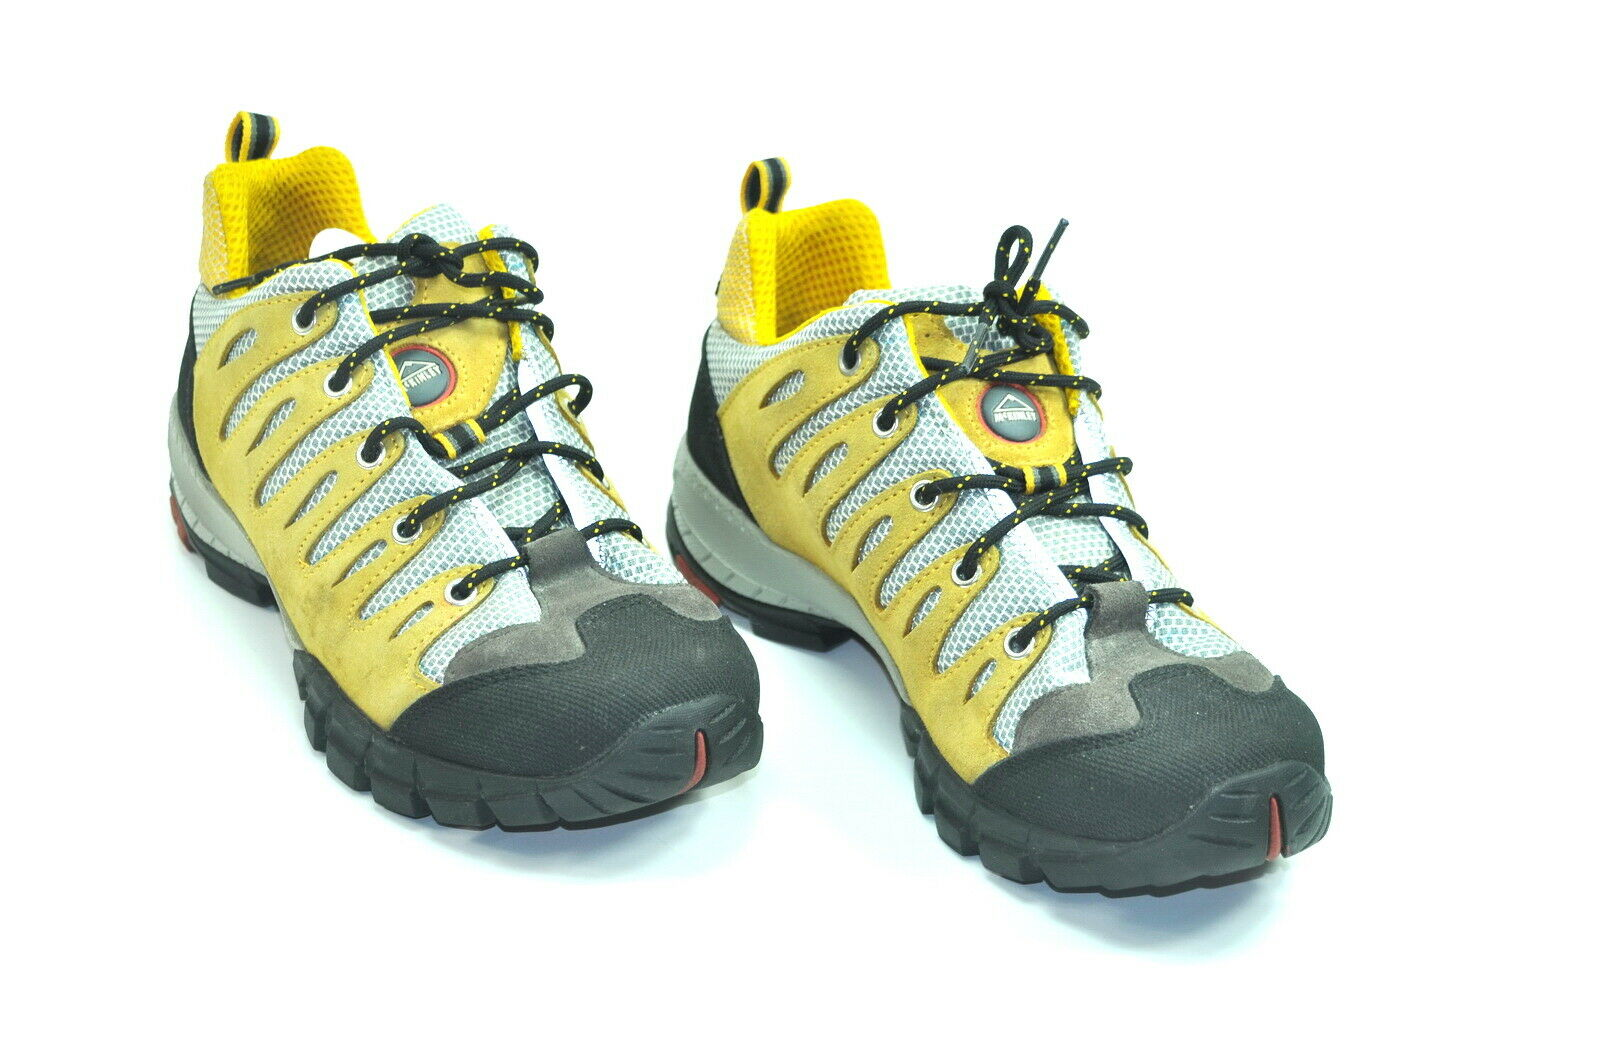 McKinley Herren Trekking Wanderschuhe Stiefel Gr. 41 Nr. 9-K 965